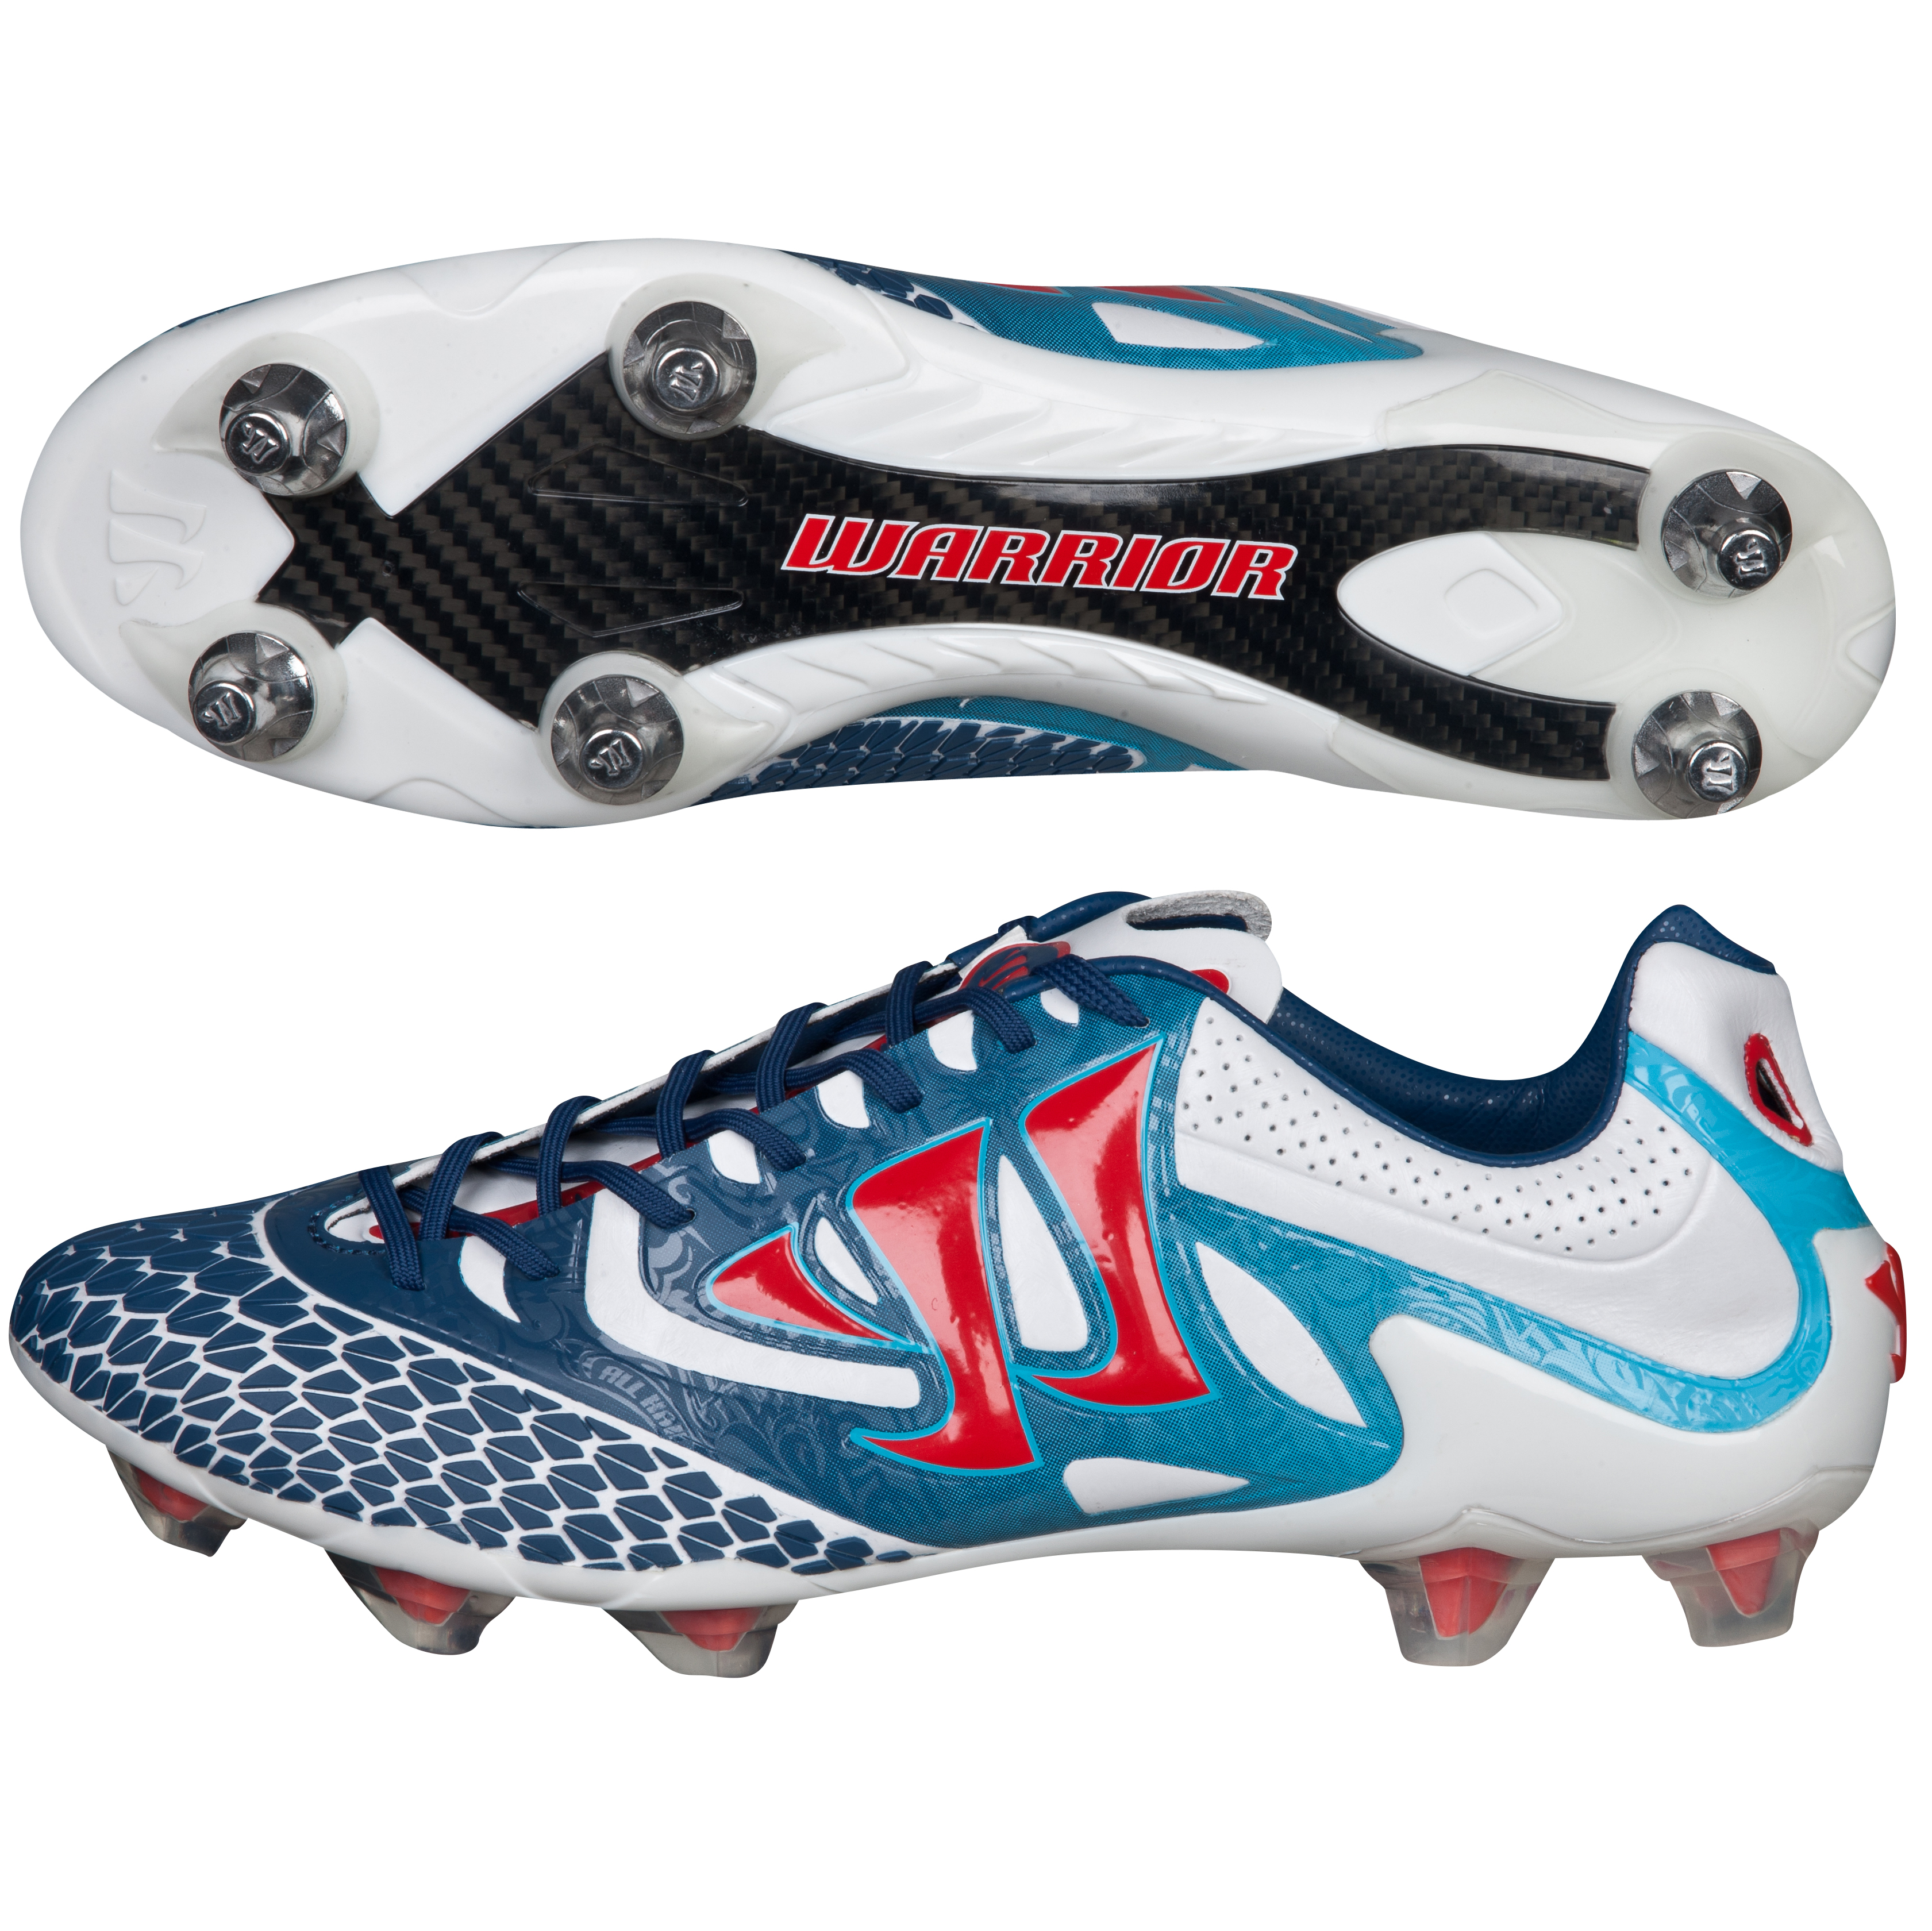 Warrior Sports Skreamer S-Lite Firm Ground Football Boots-Wht/Navy/Red White